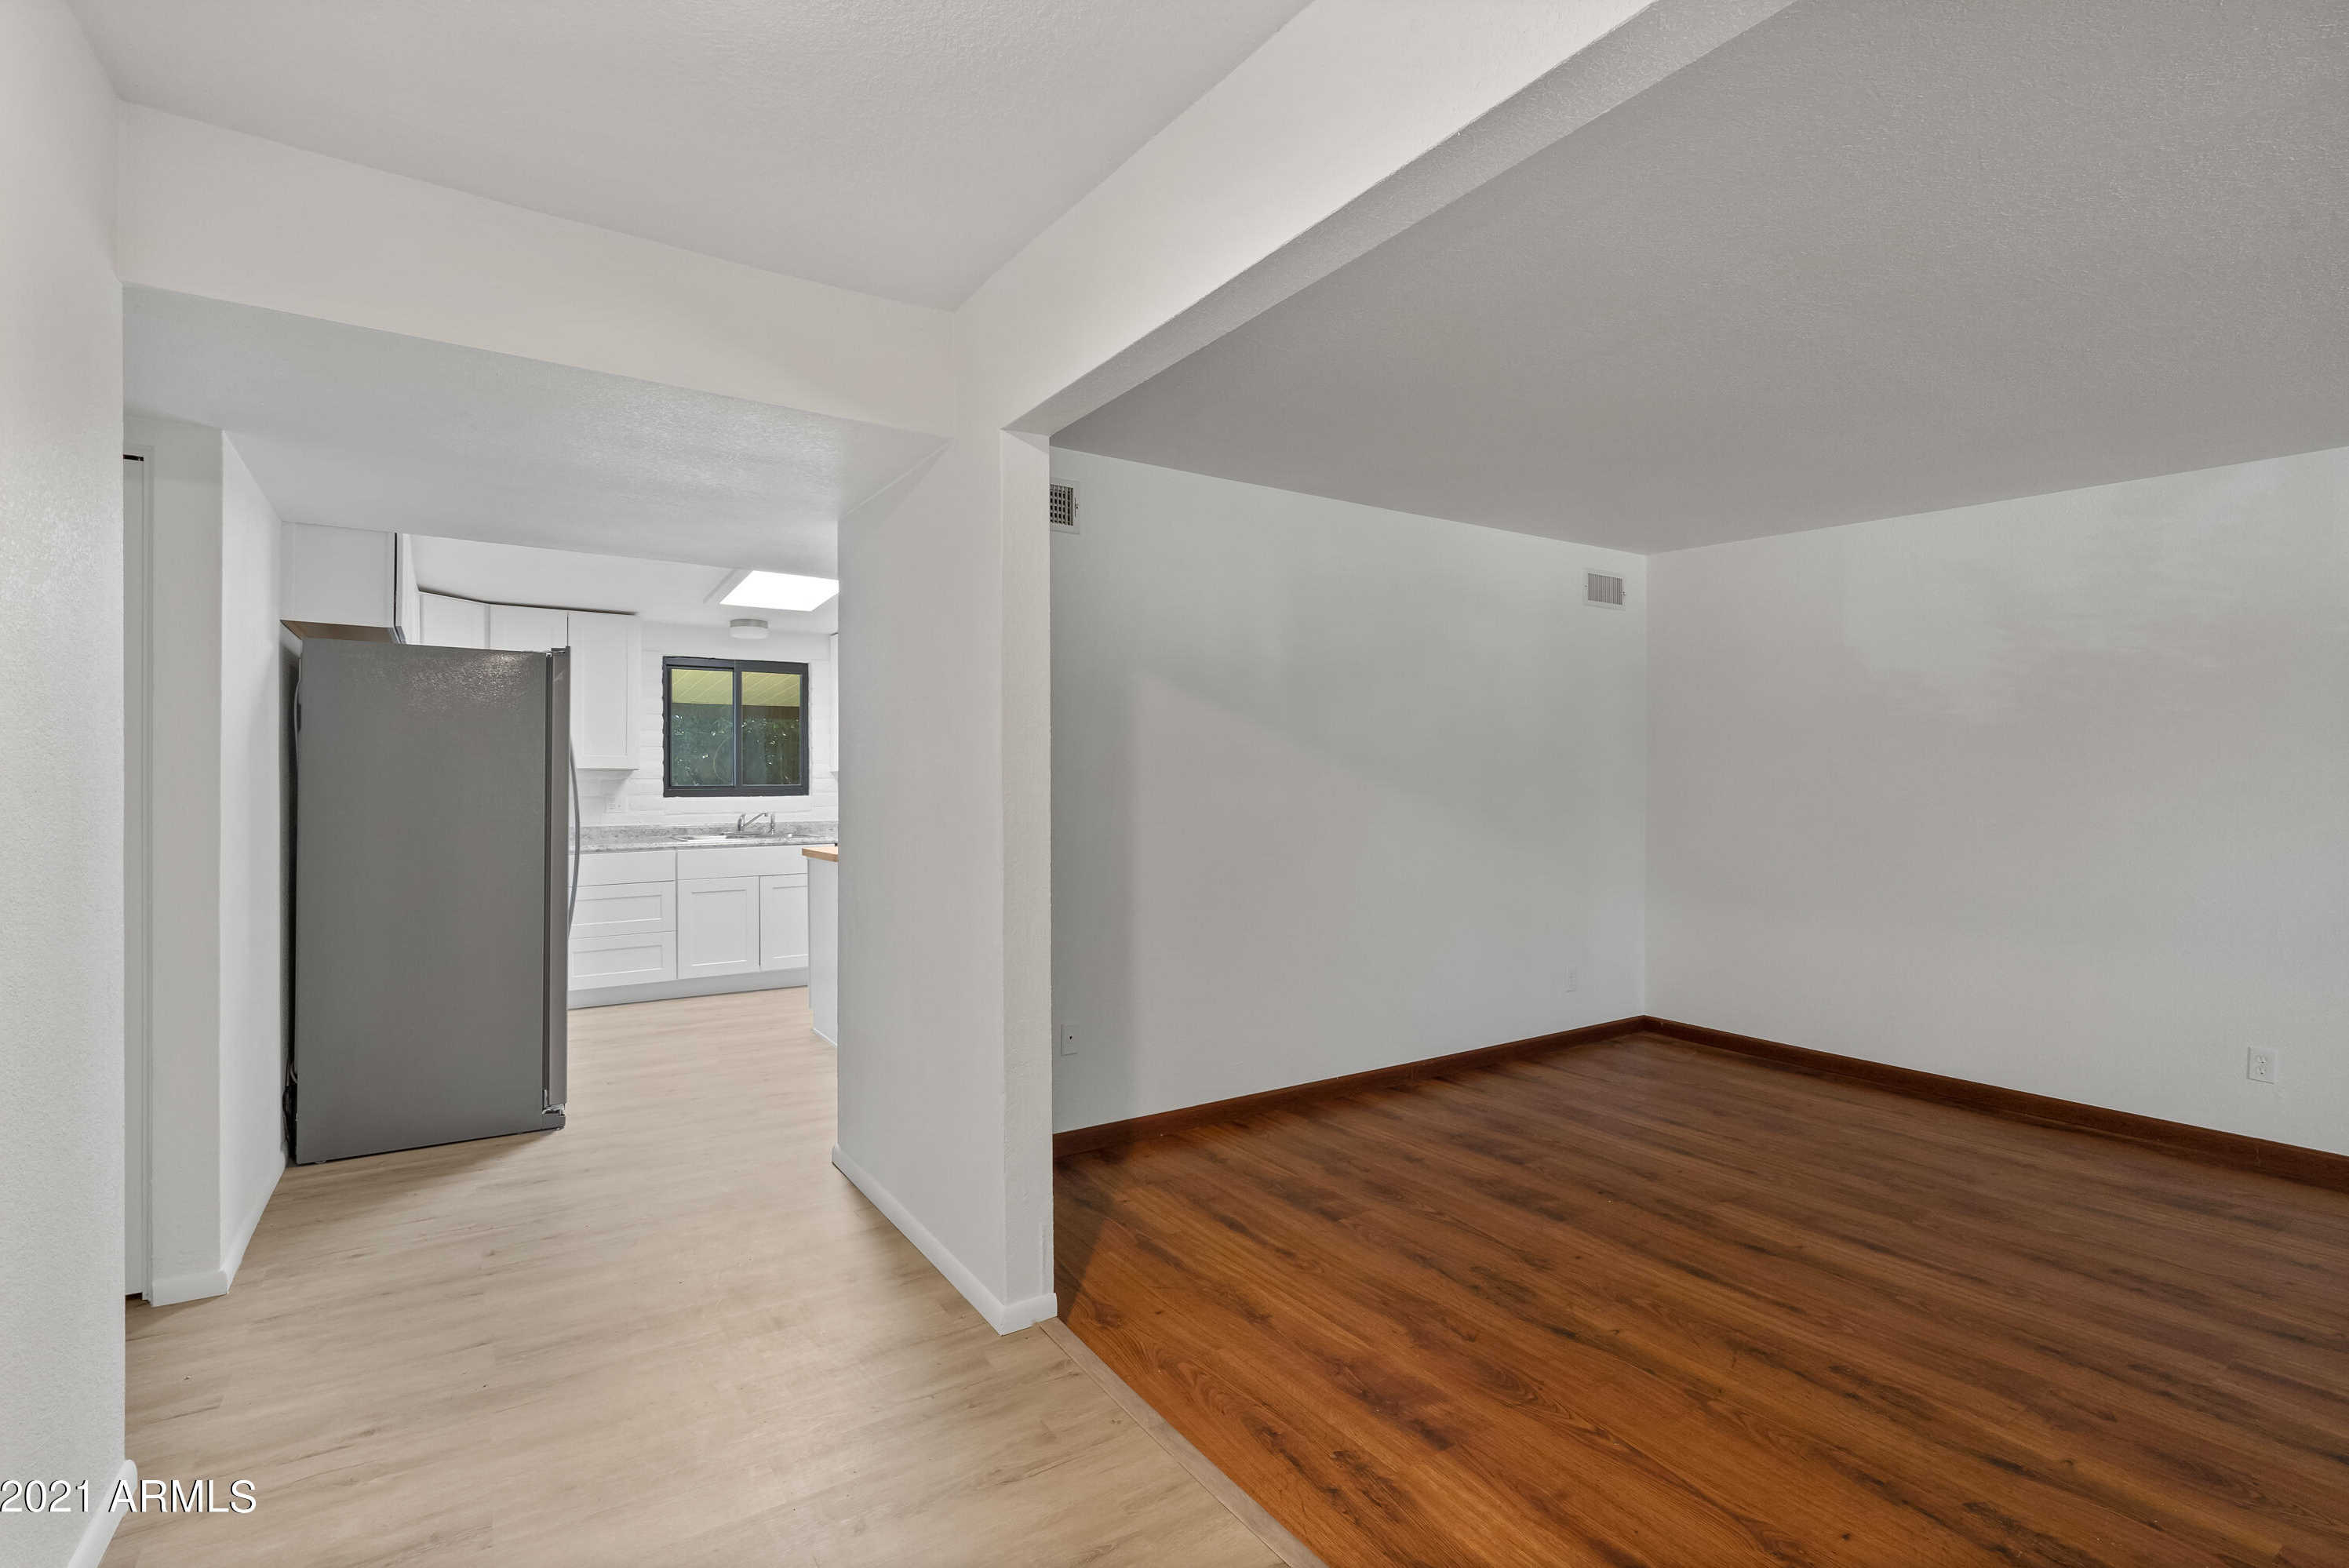 $234,900 - 4Br/2Ba - Home for Sale in The Village, Sierra Vista